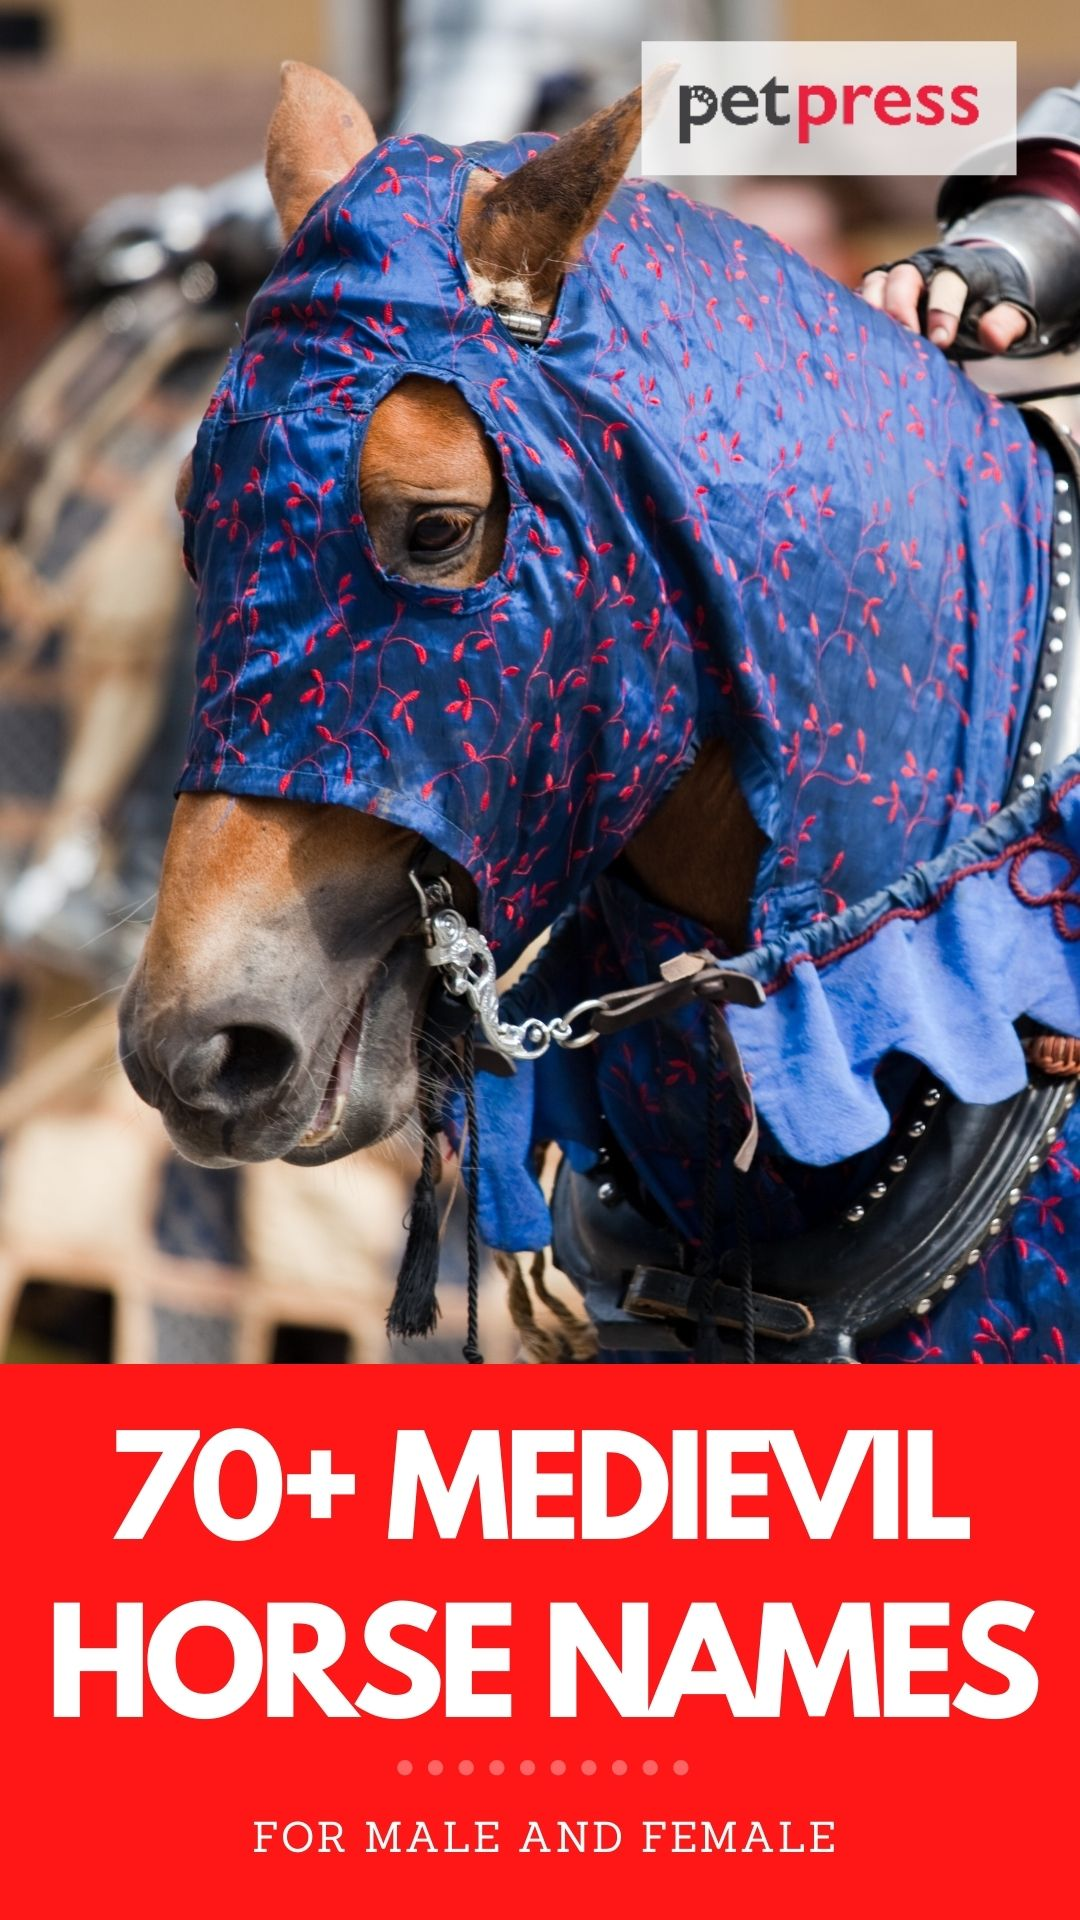 70+ medievil horse names